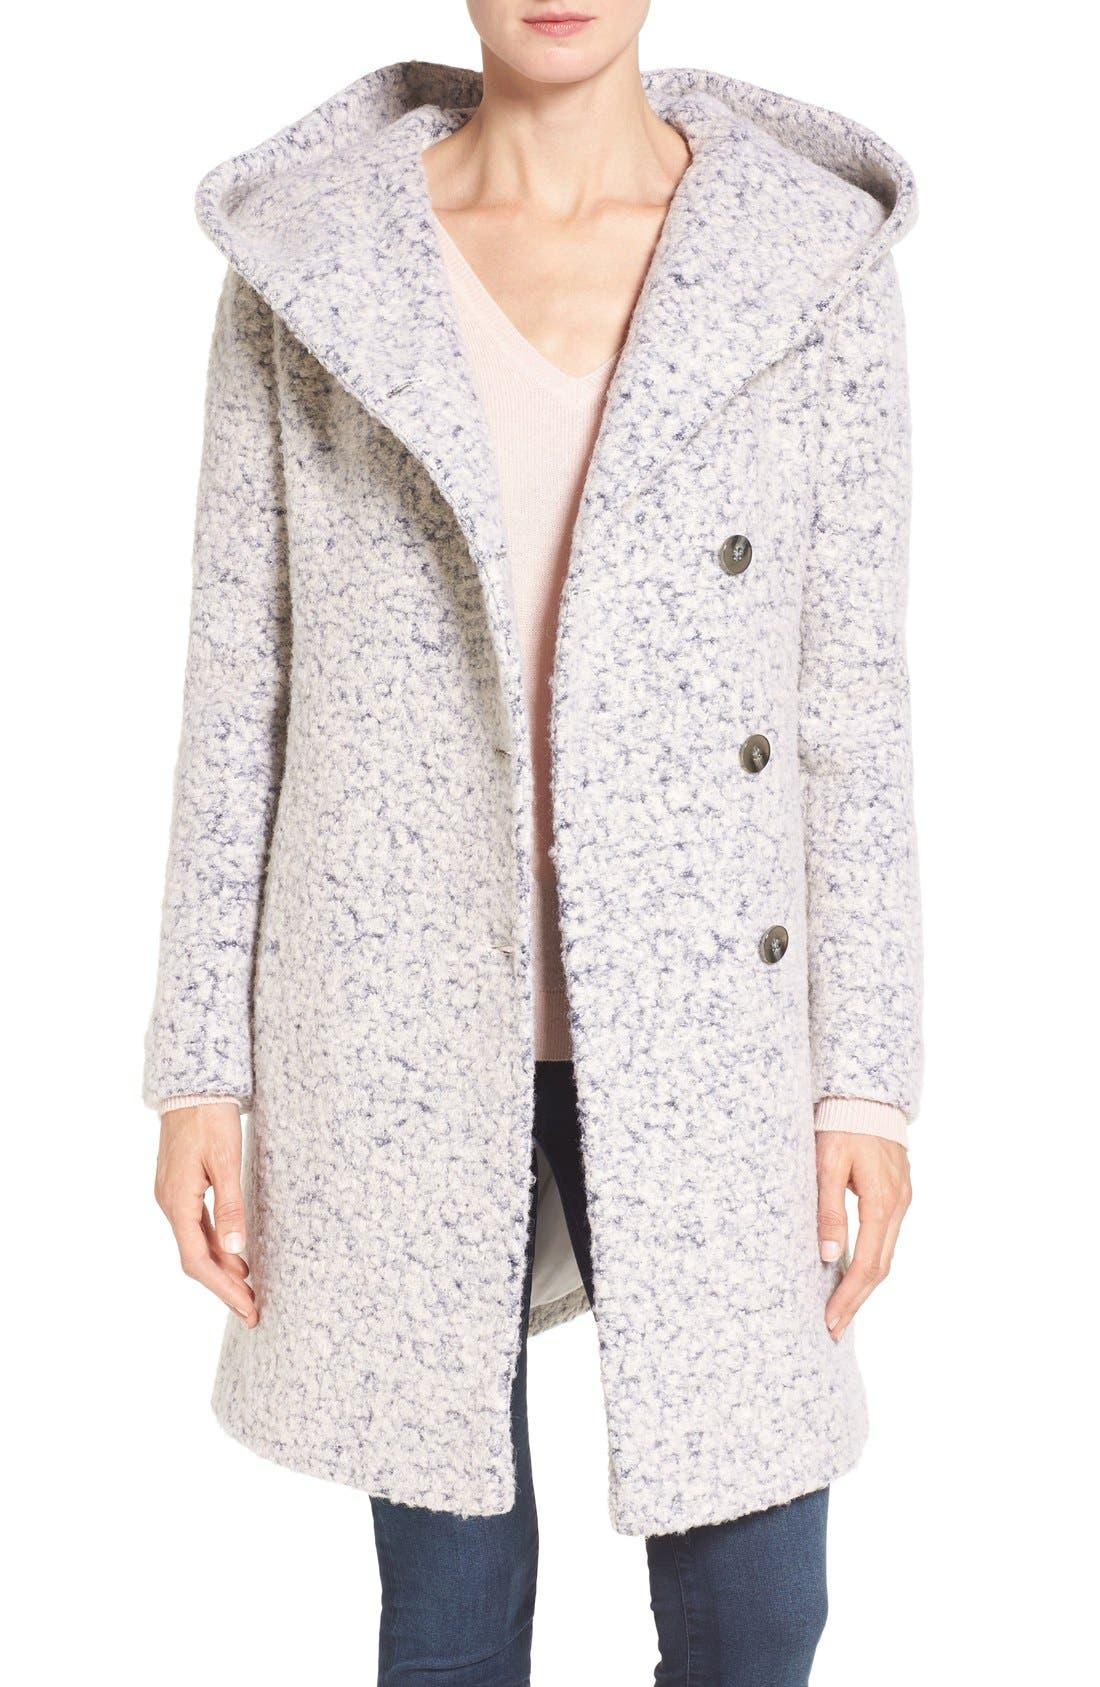 Alternate Image 1 Selected - Cole Haan Signature Hooded Bouclé Coat